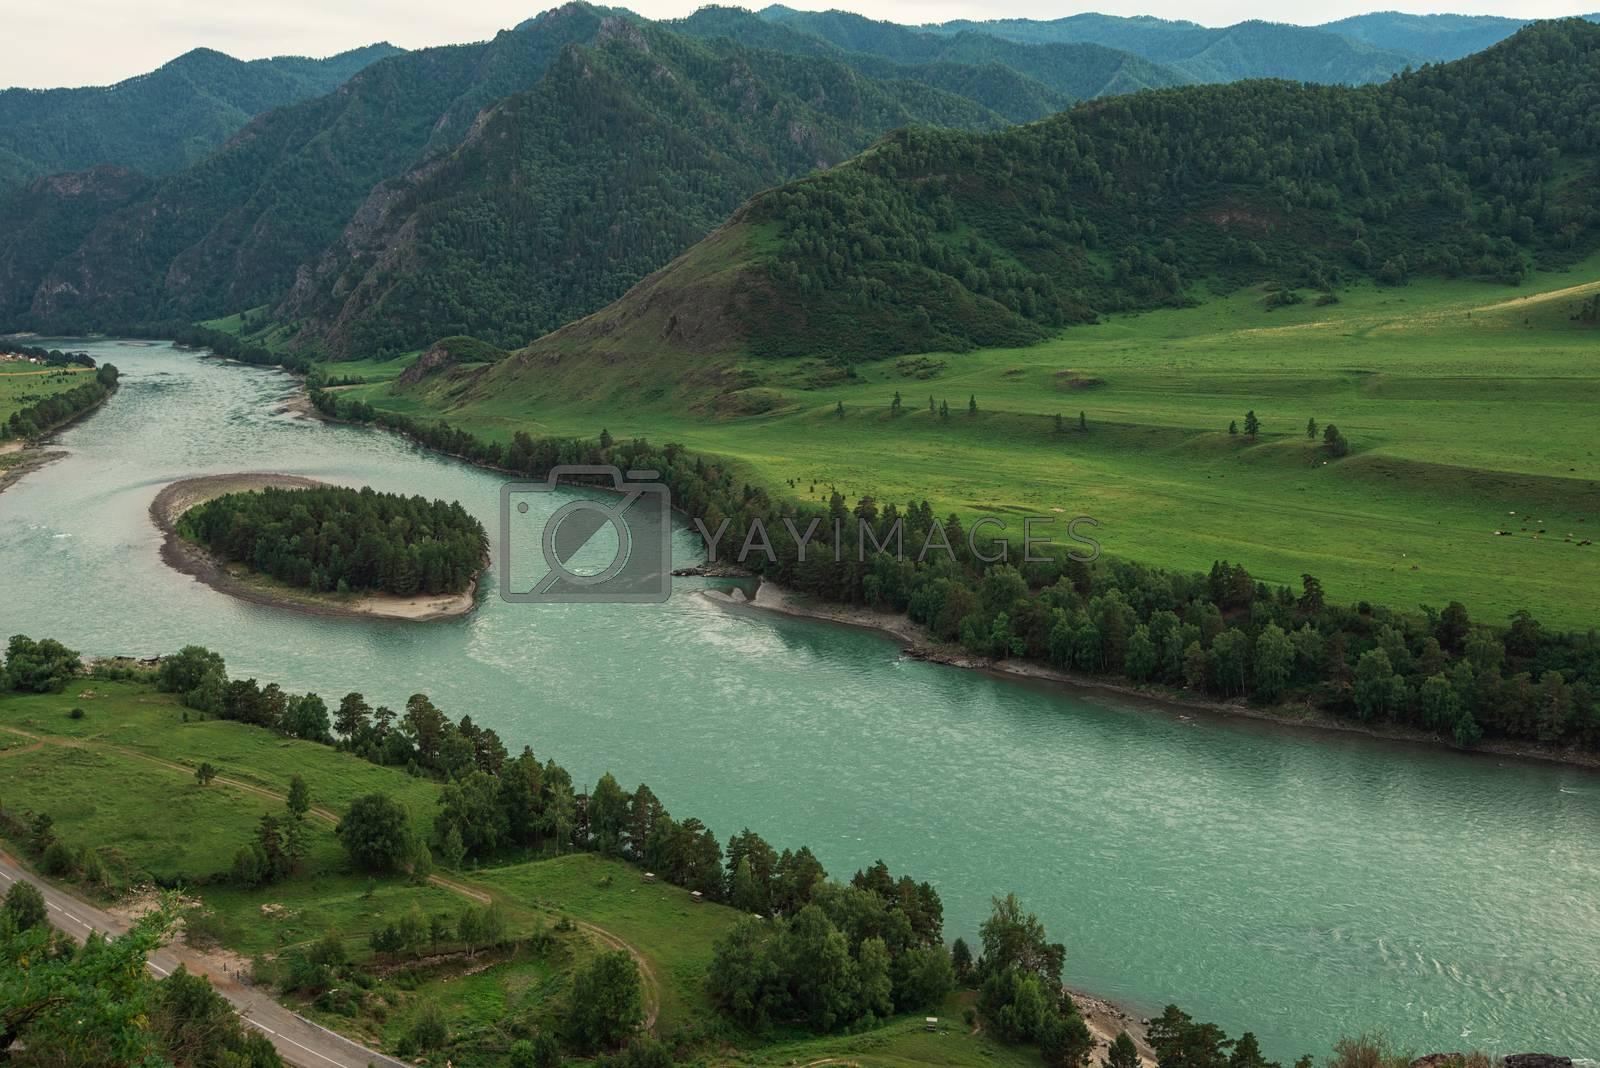 Waterfall Che-Chkish in Altai Mountains territory, West Siberia, Russia